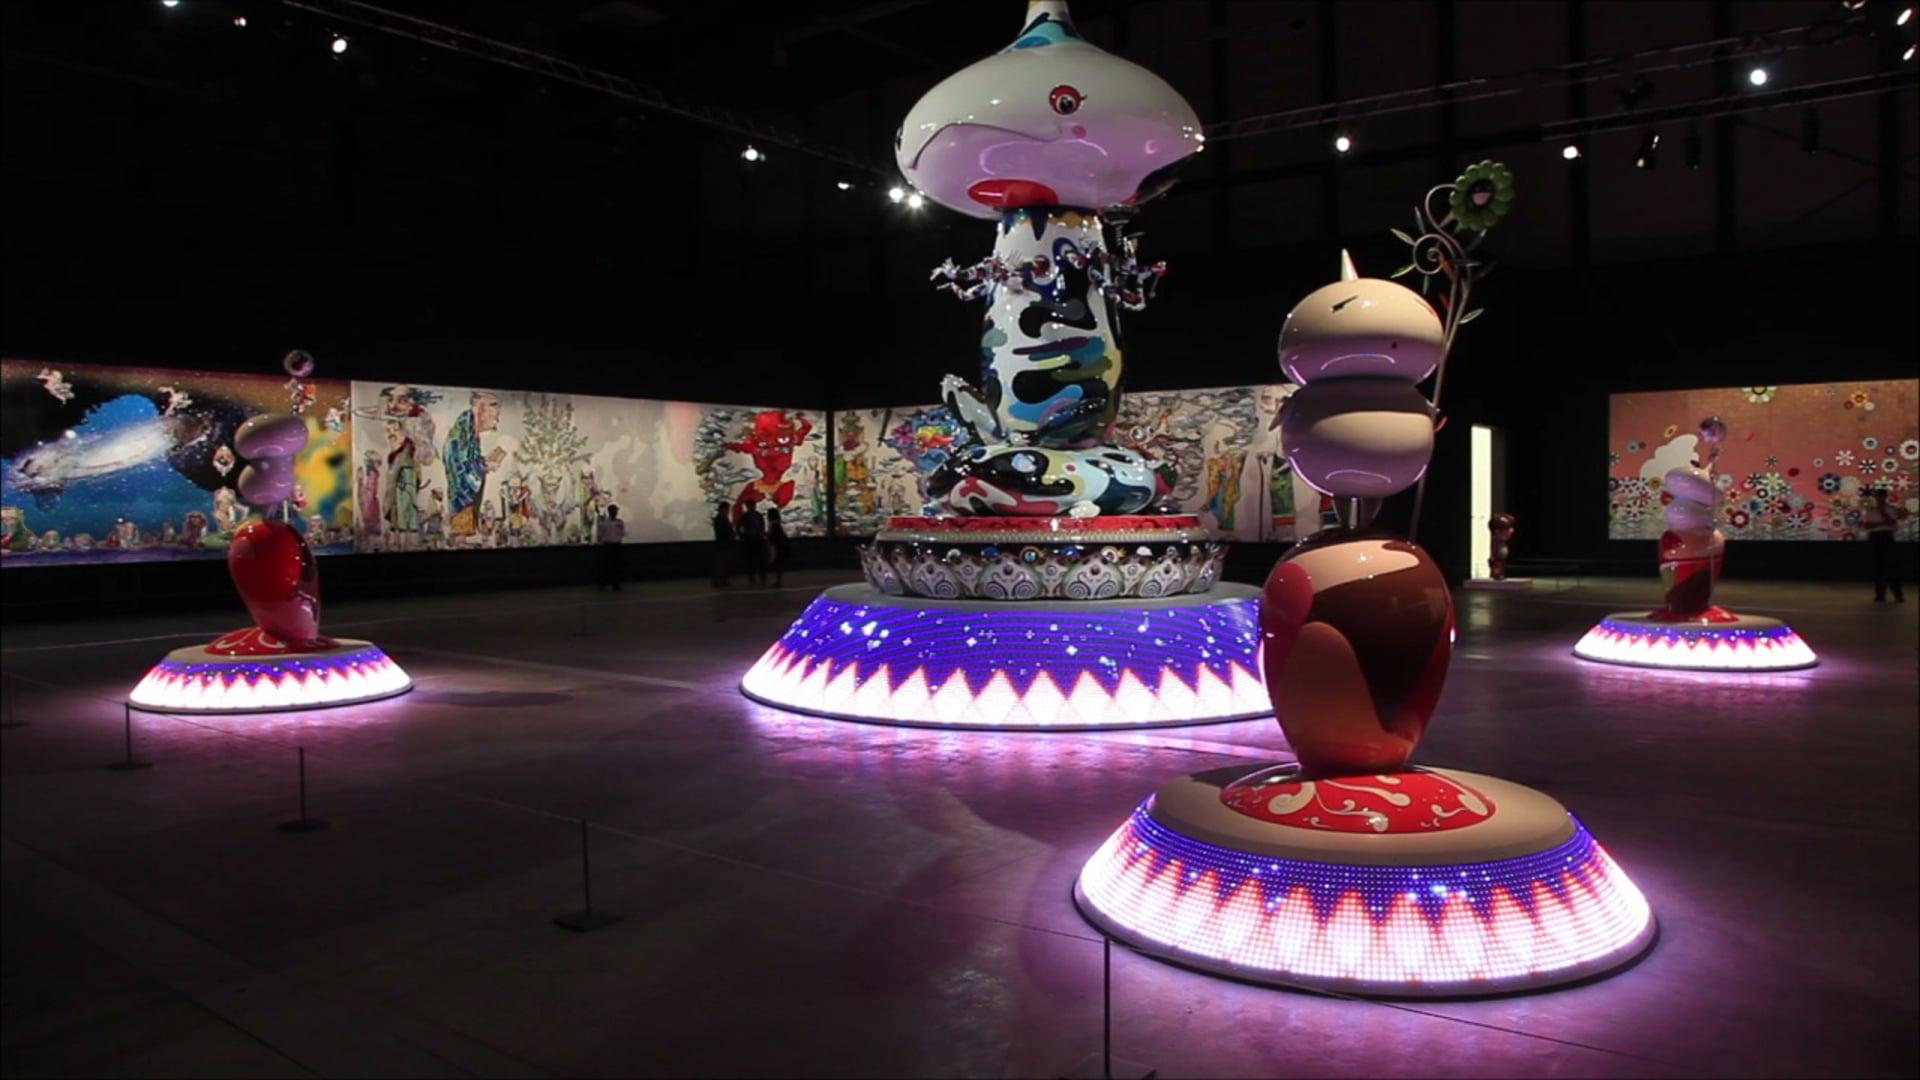 Takashi Murakami - Ego Exhibition